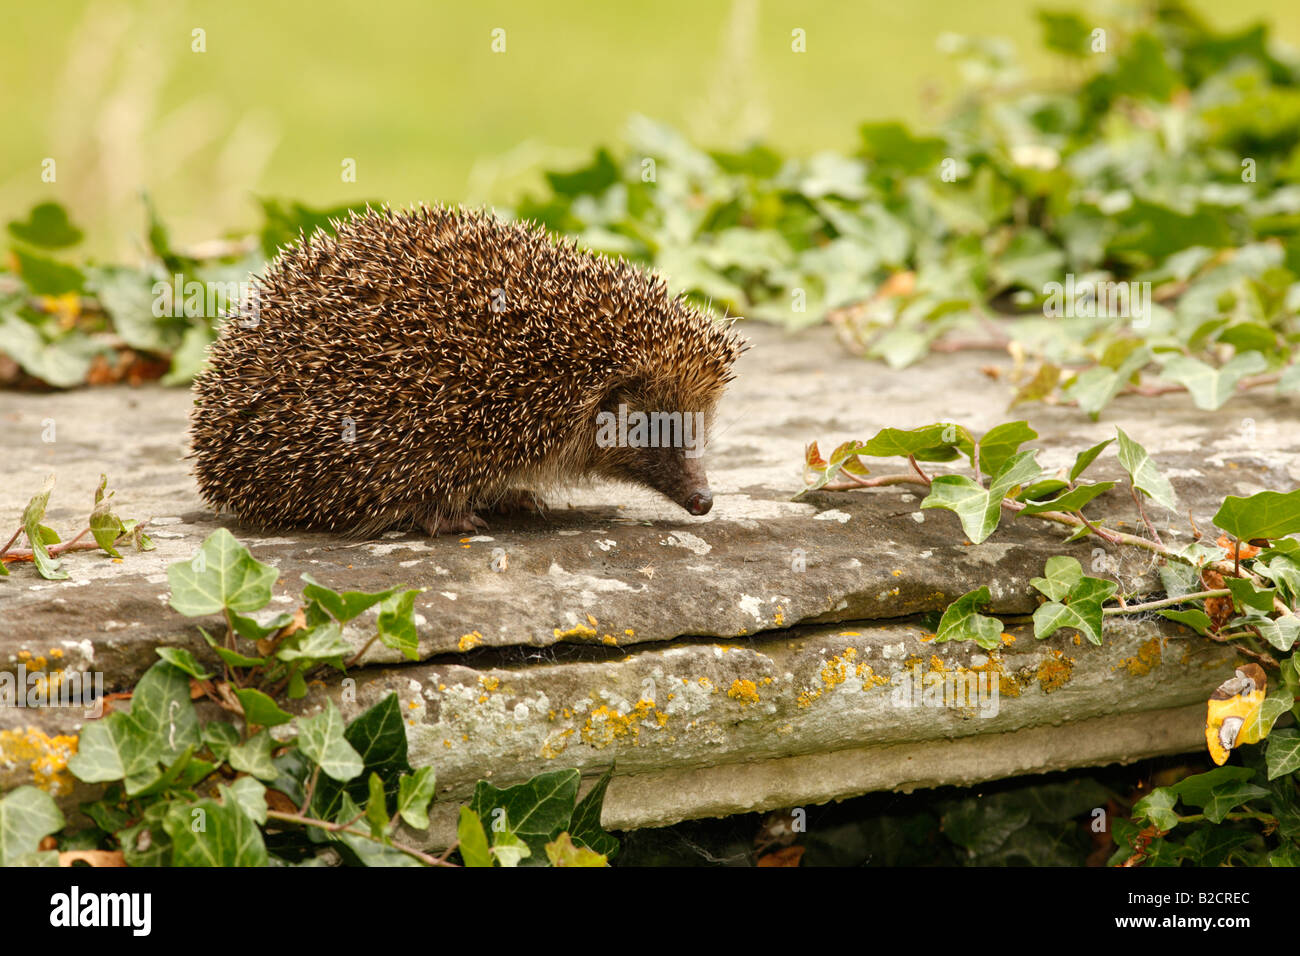 Hedgehog Erinaceus europaeus summer West Midlands - Stock Image